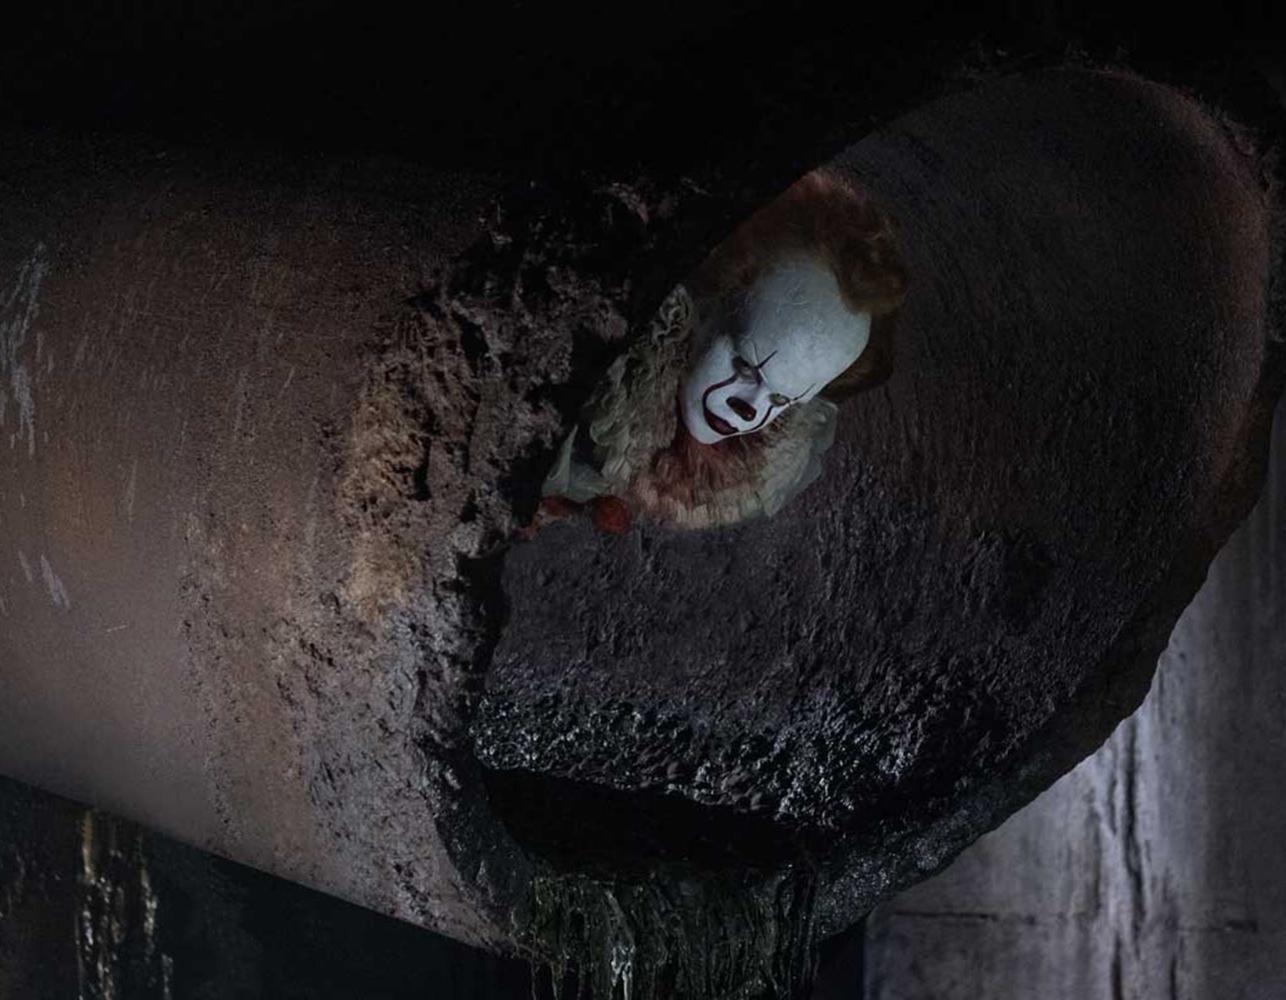 Bill Skarsgard stars as Pennywise the Dancing Clown in